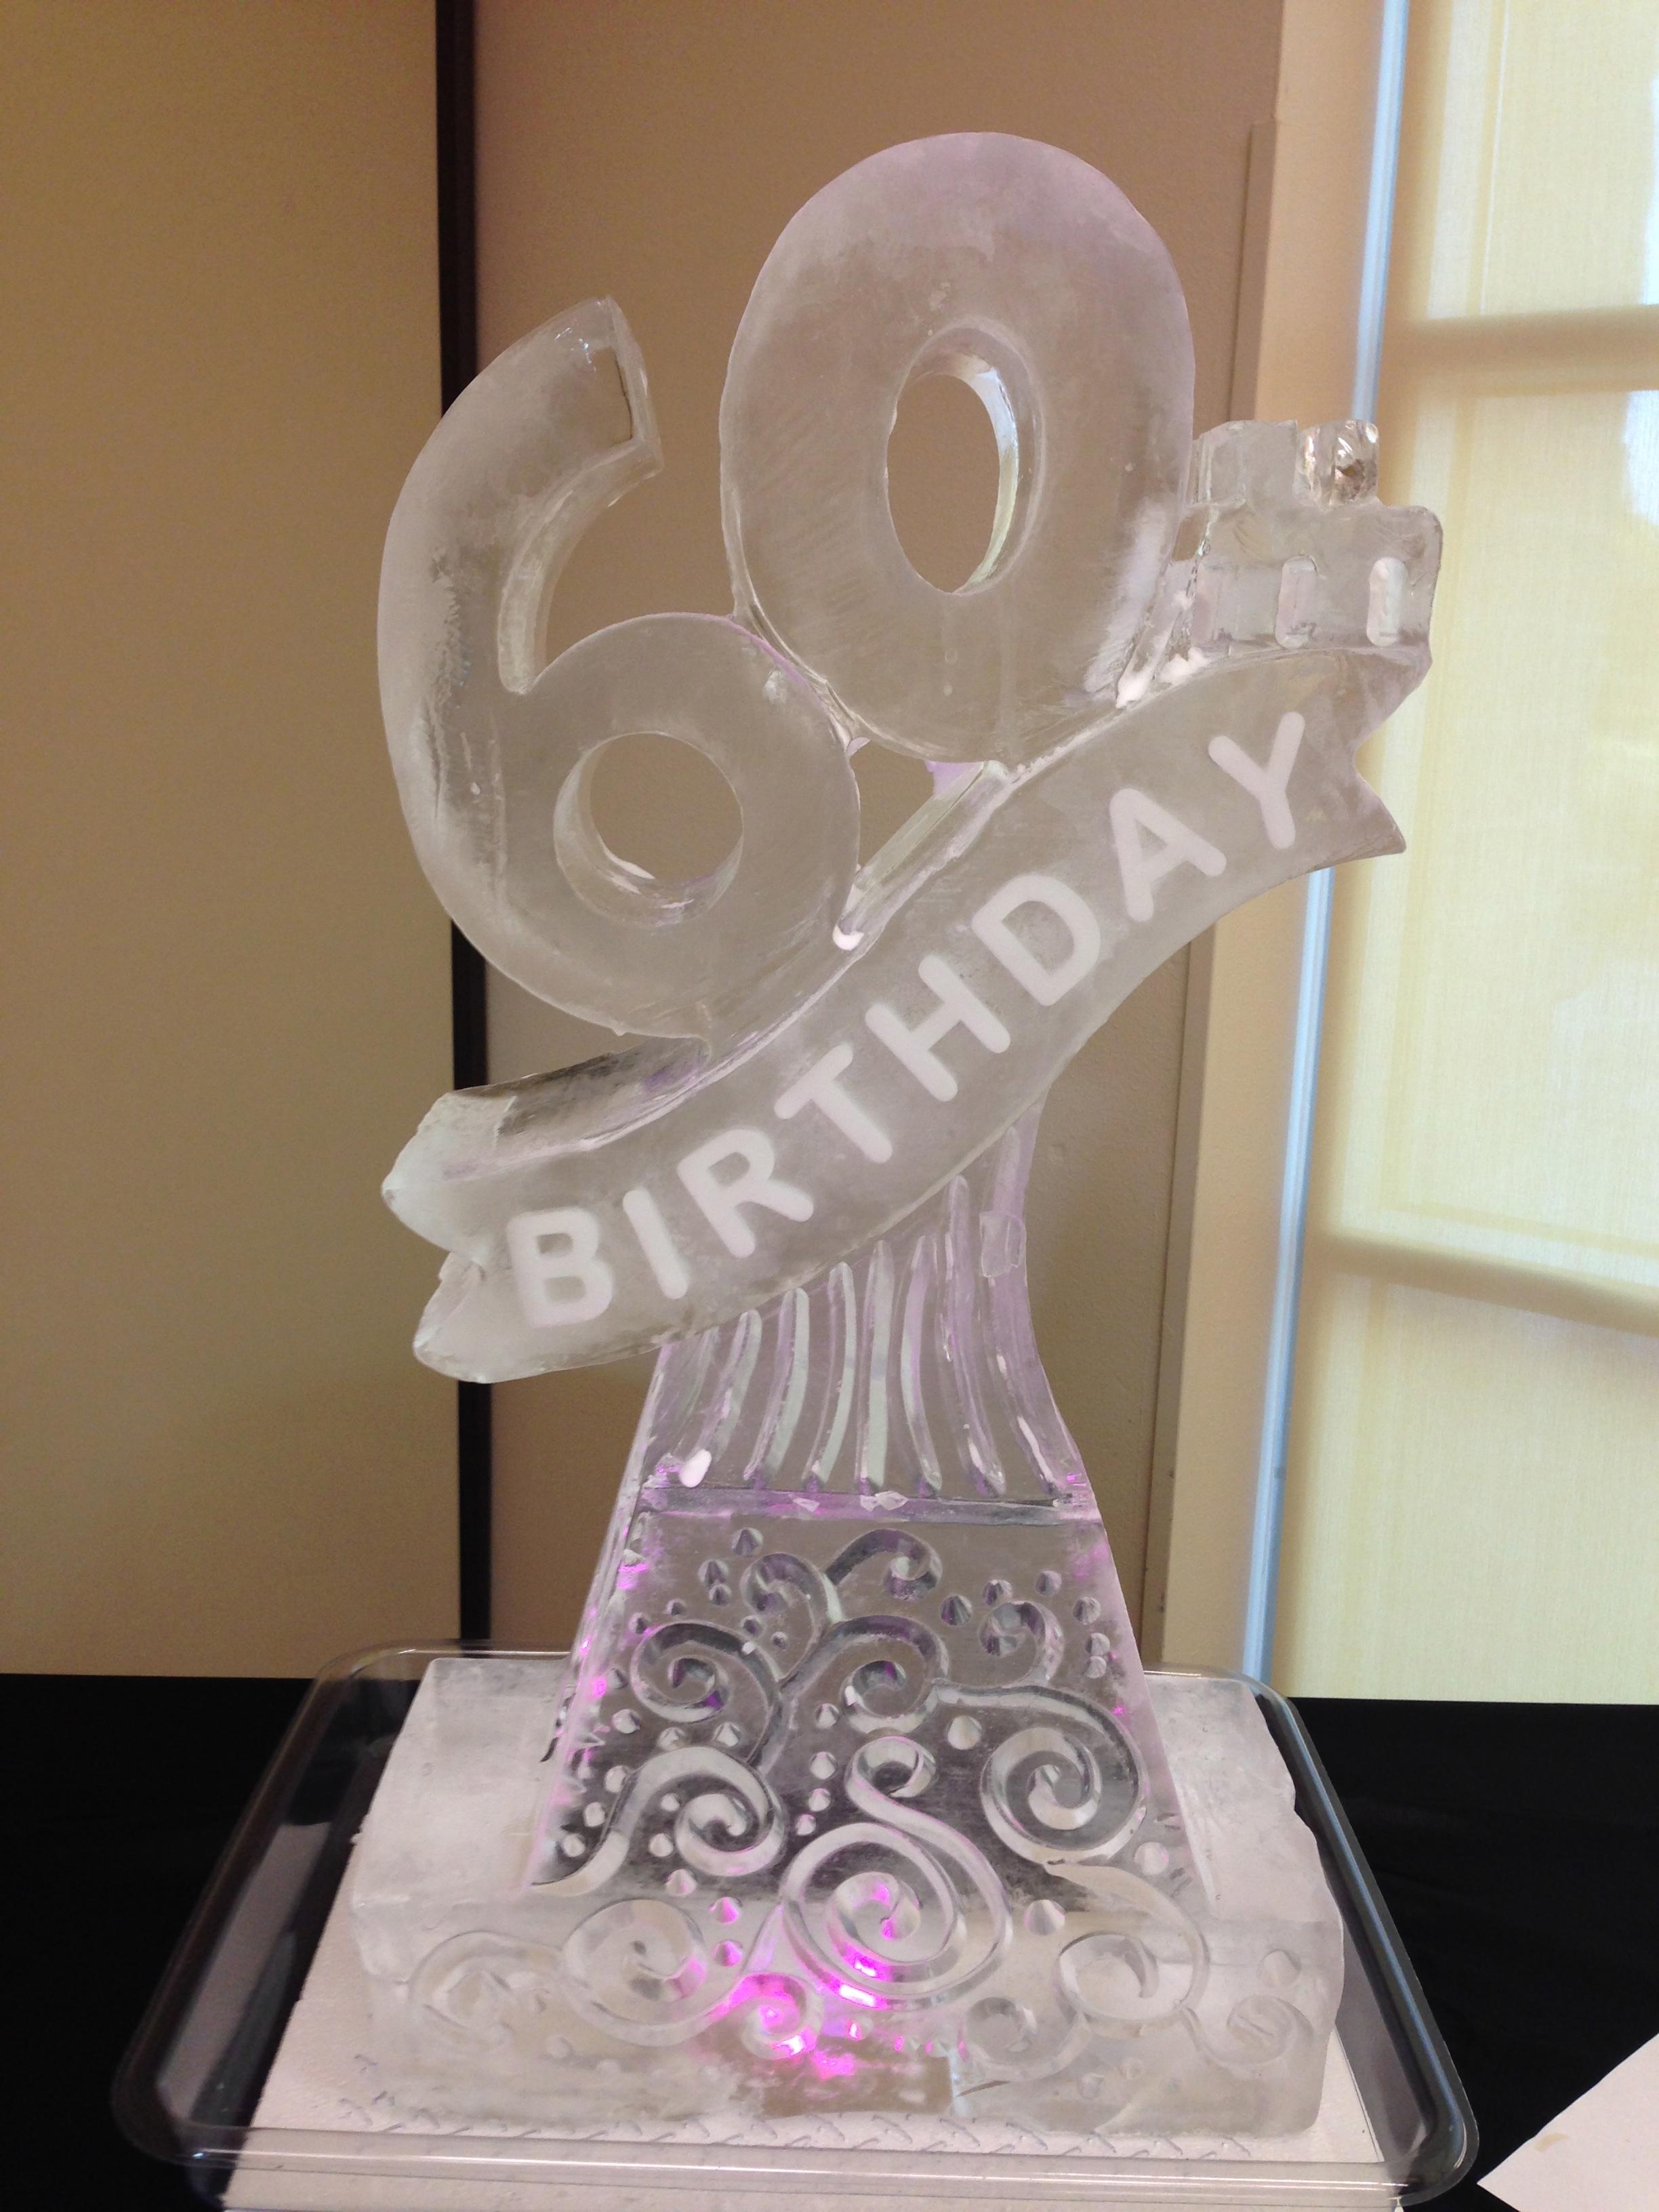 60th Birthday ice sculpture